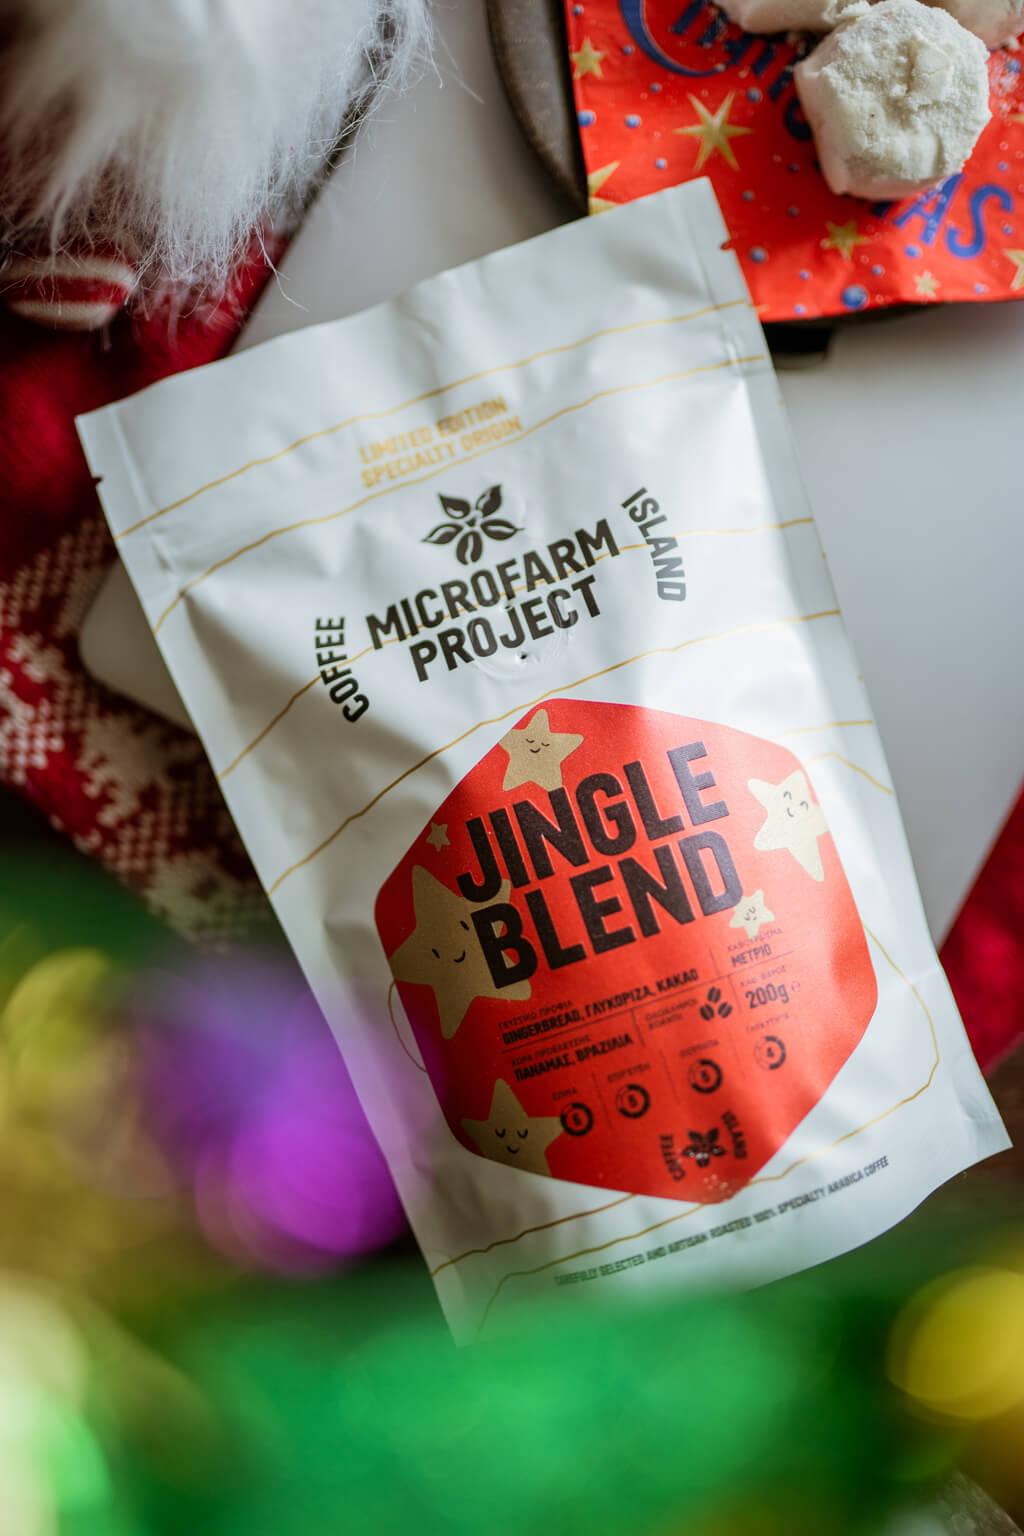 Coffee Island's jingle blend.